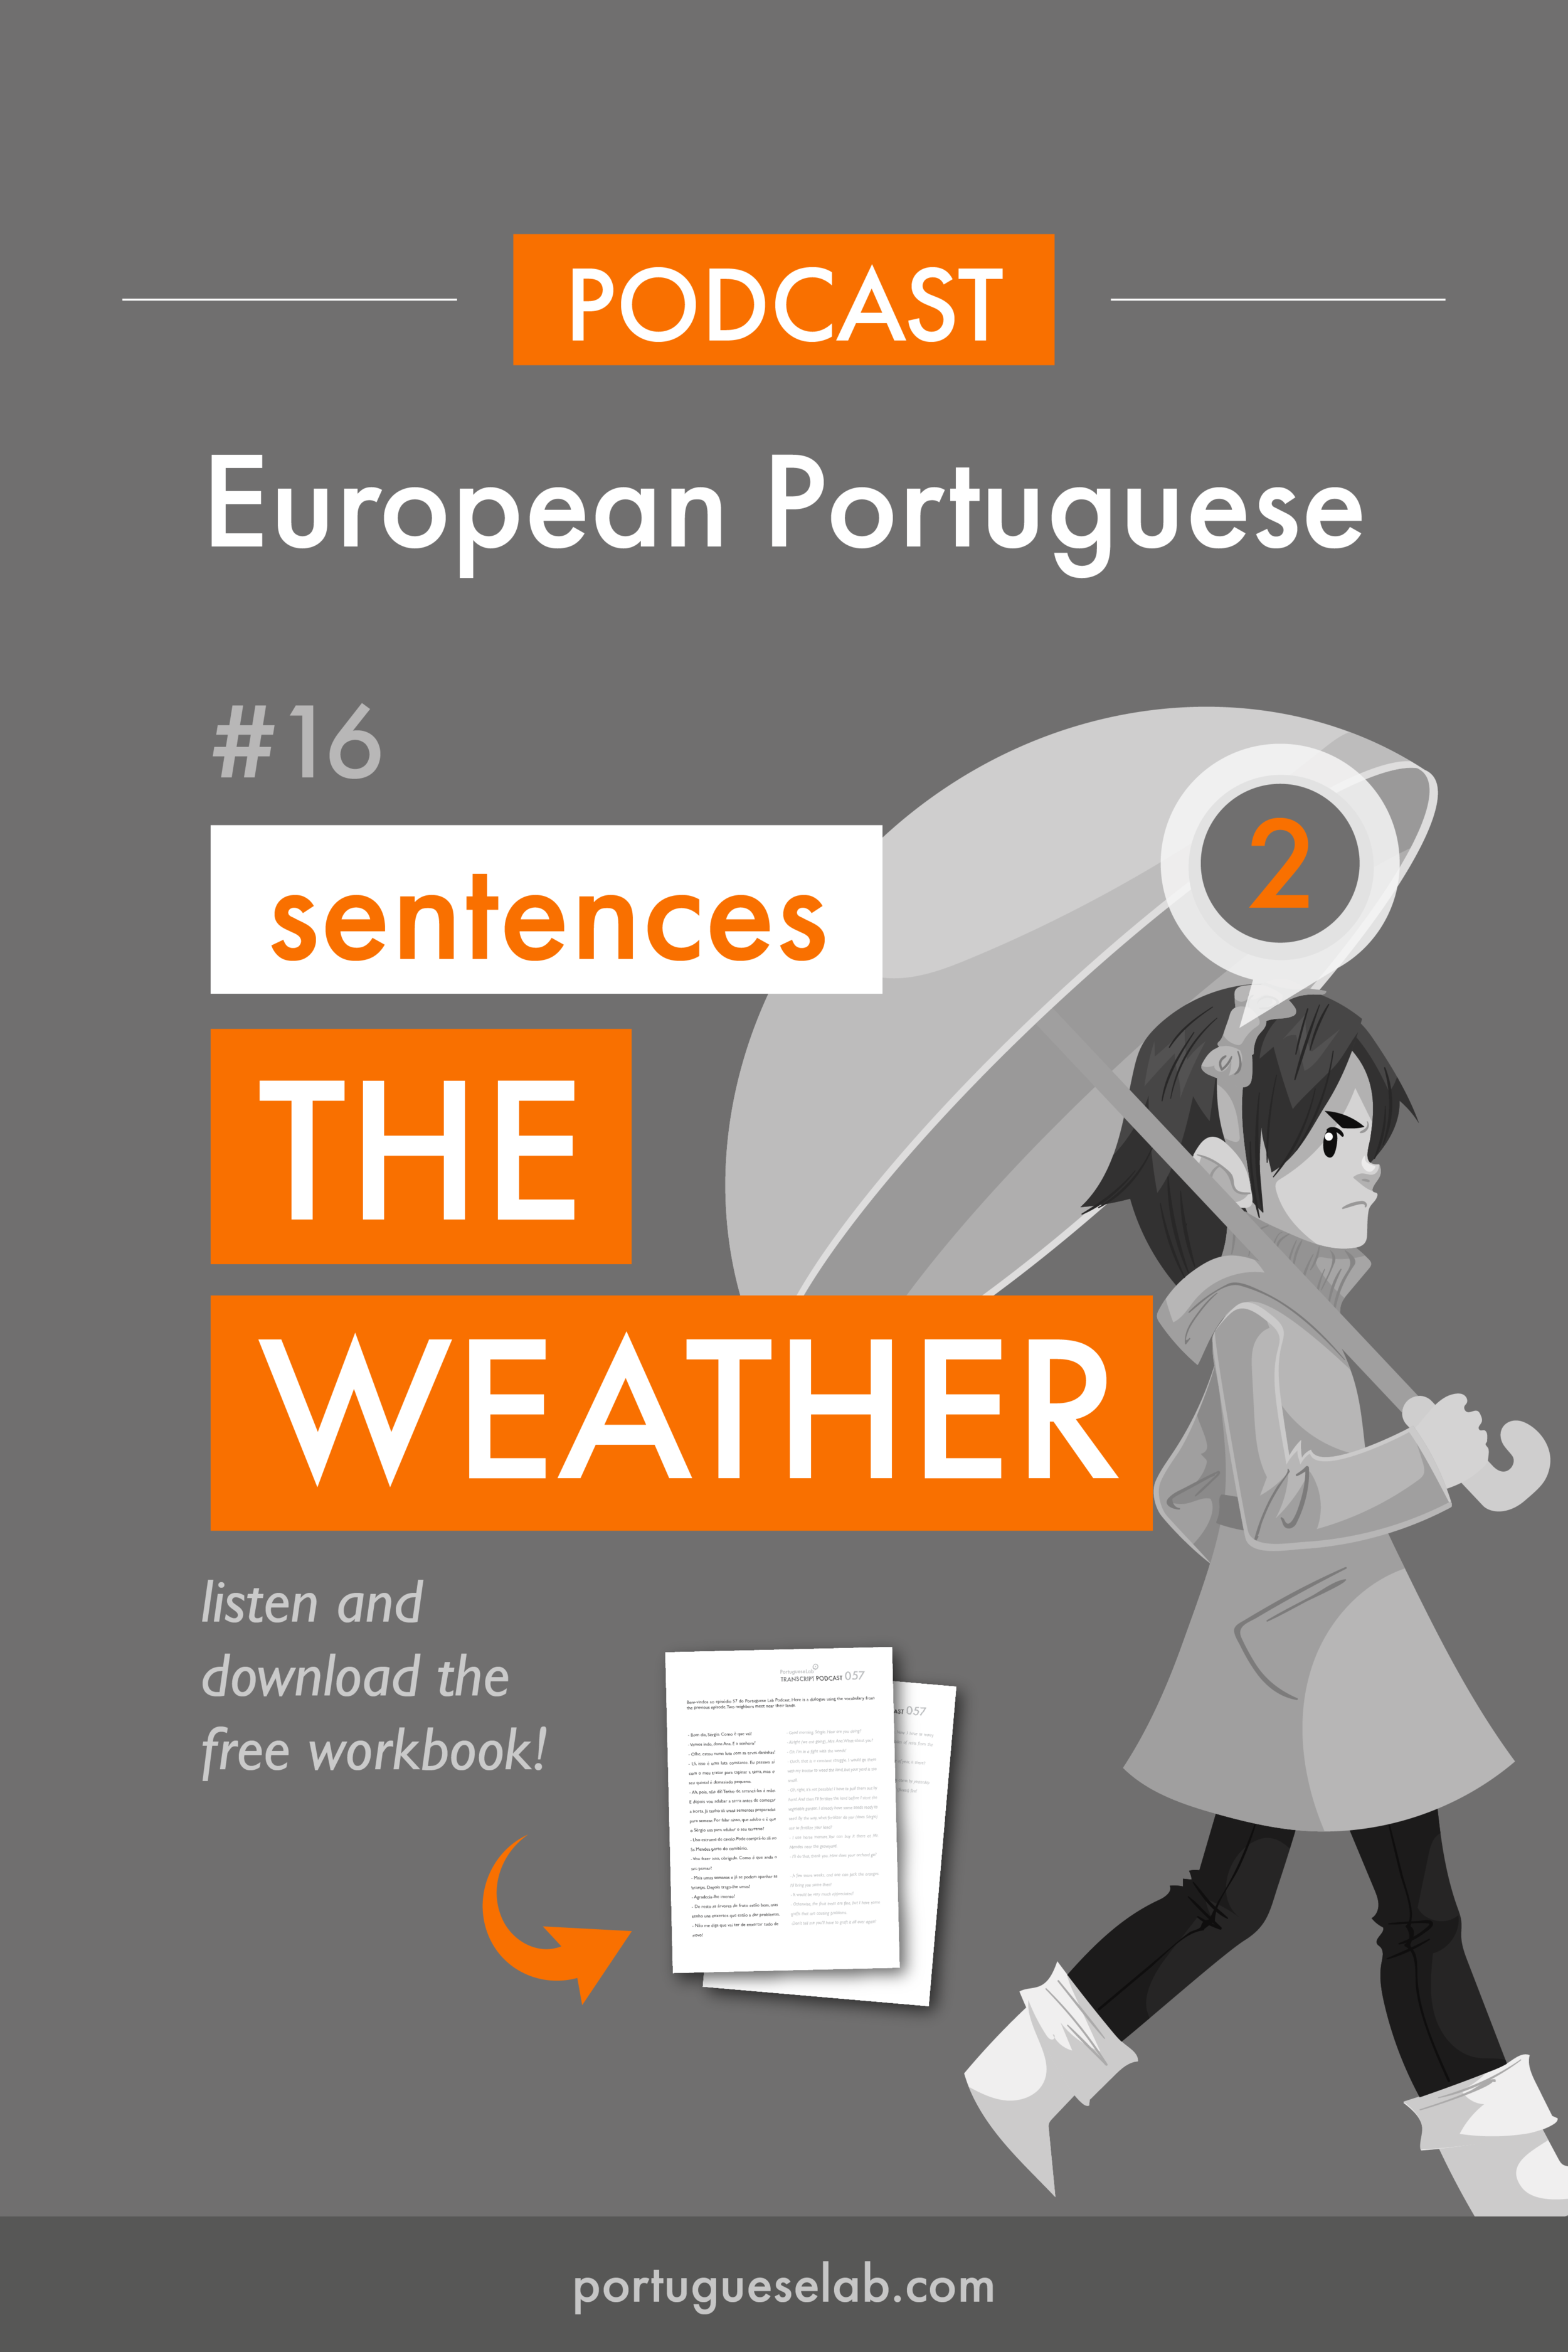 Portuguese Lab Podcast - European Portuguese - 16 - Sentences about the weather.png